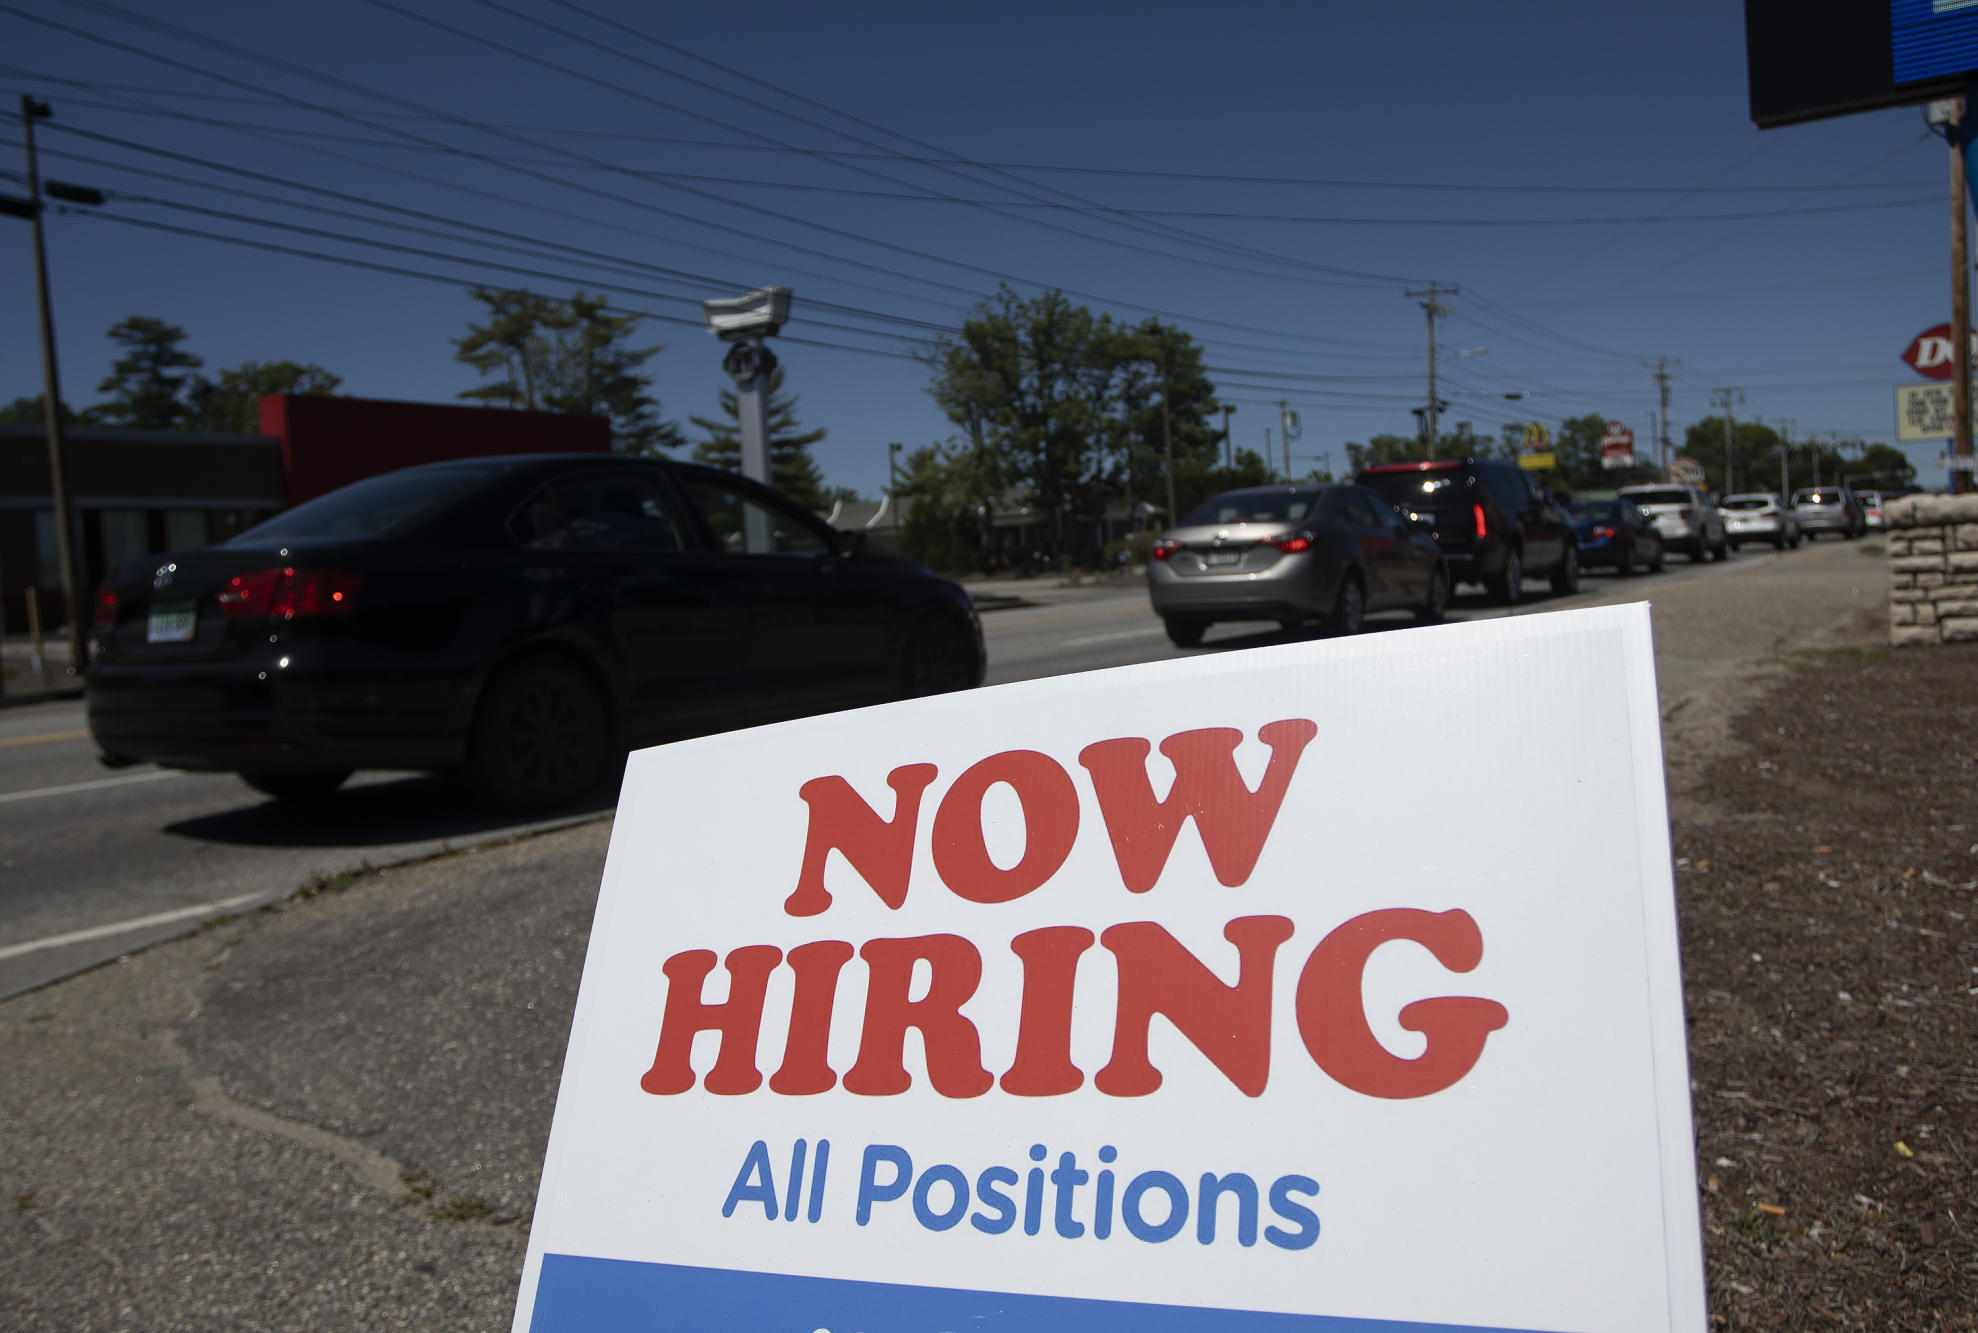 job morning brief companies listings